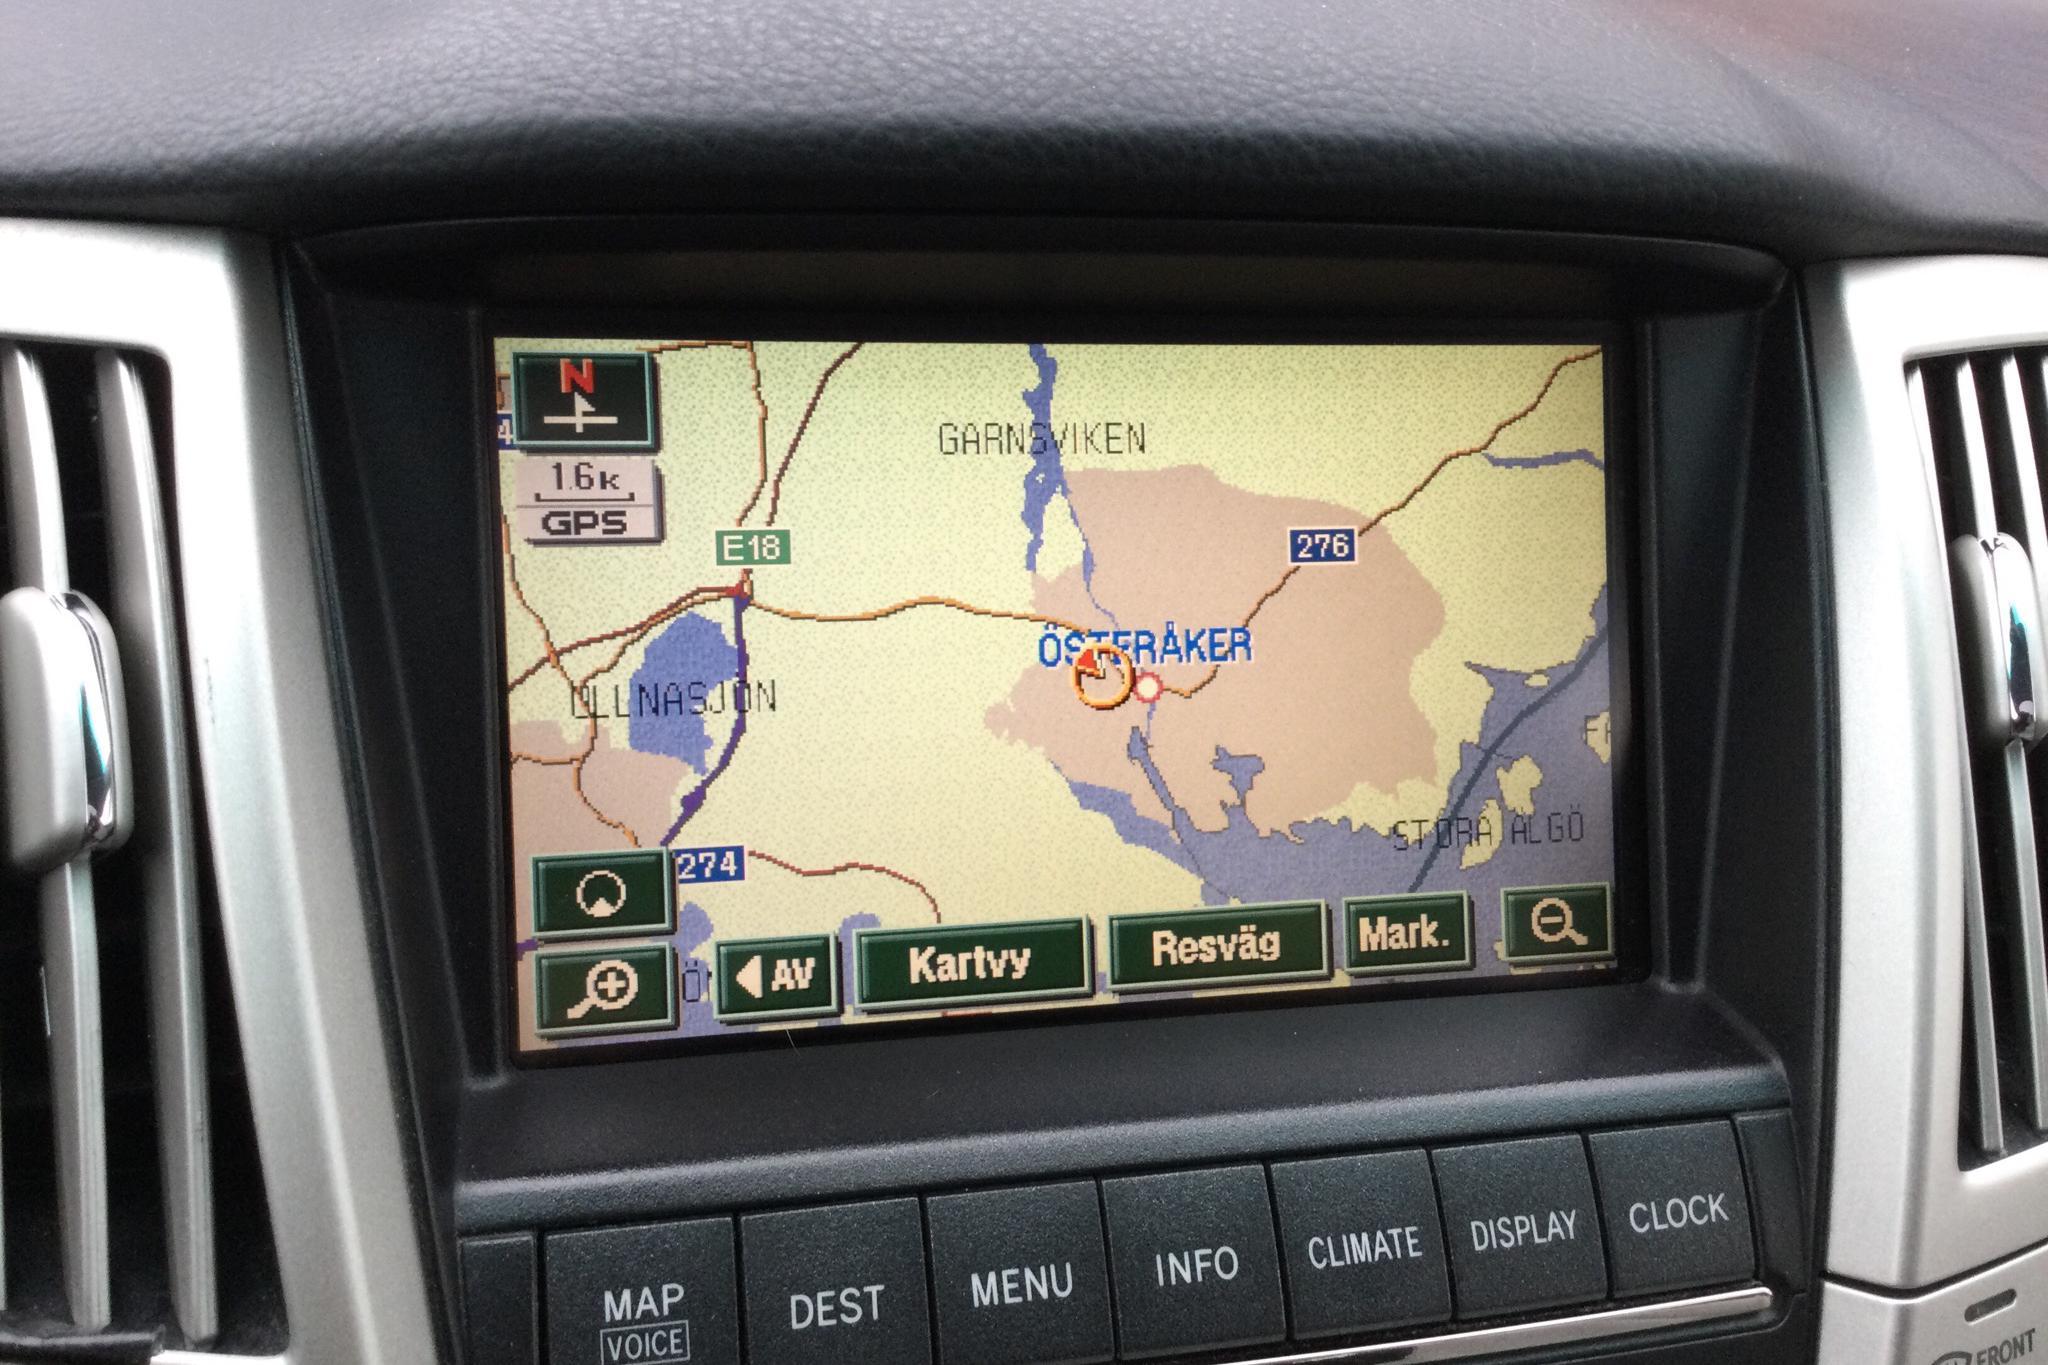 Lexus RX 300 (204hk) - 261 720 km - Automatic - Dark Green - 2005